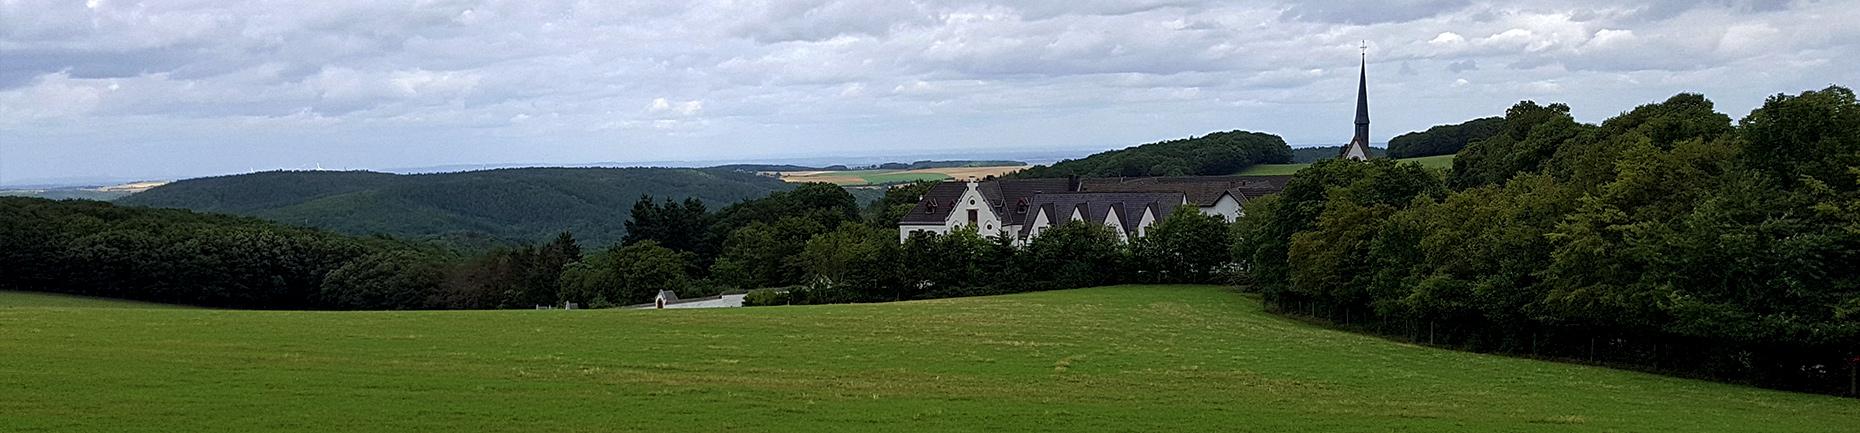 Nationalpark Eifel Kloster Abtei Maria Wald Rursee Wildnis Trail